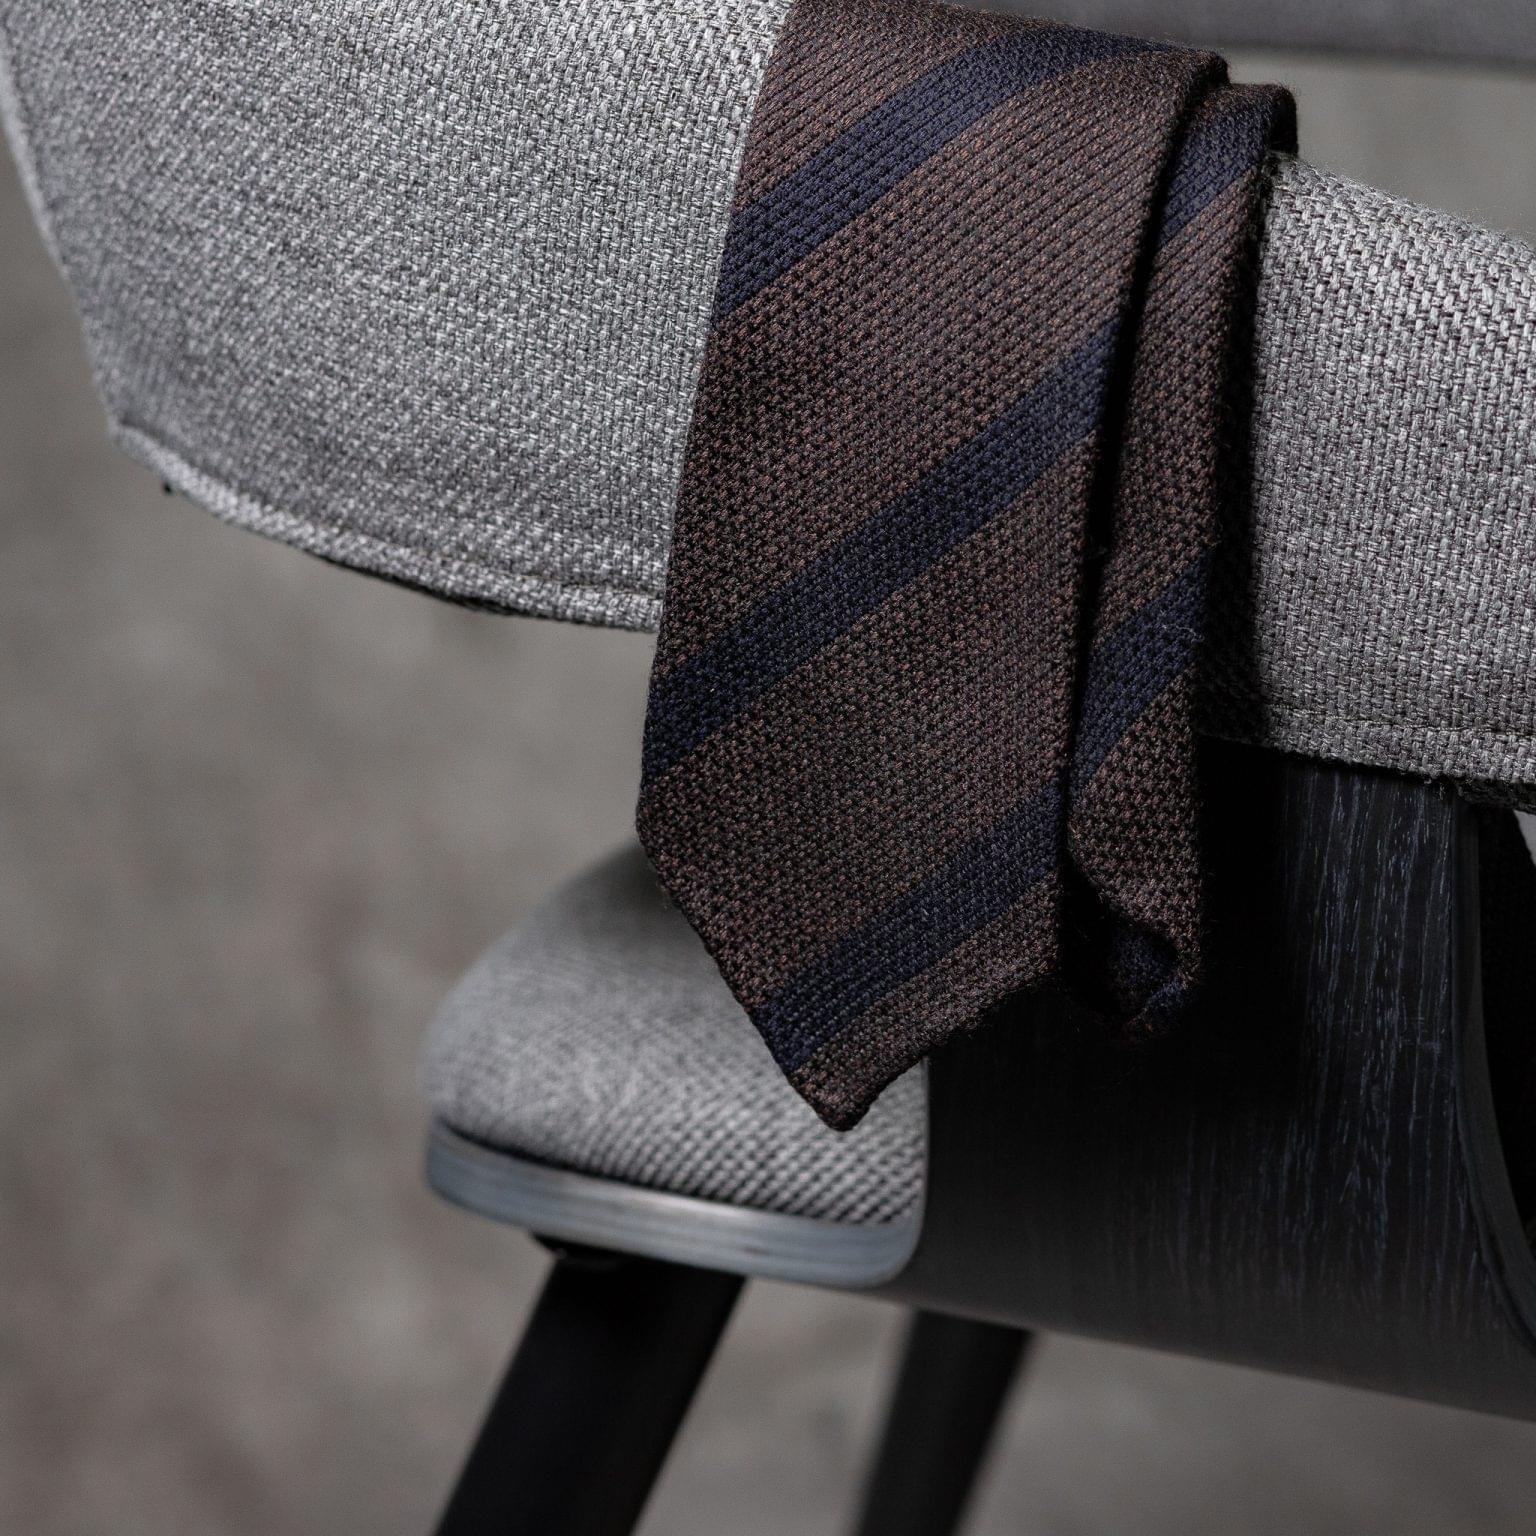 WOOL-LANA-0473-Tie-Initials-Corbata-Iniciales-The-Seelk-2